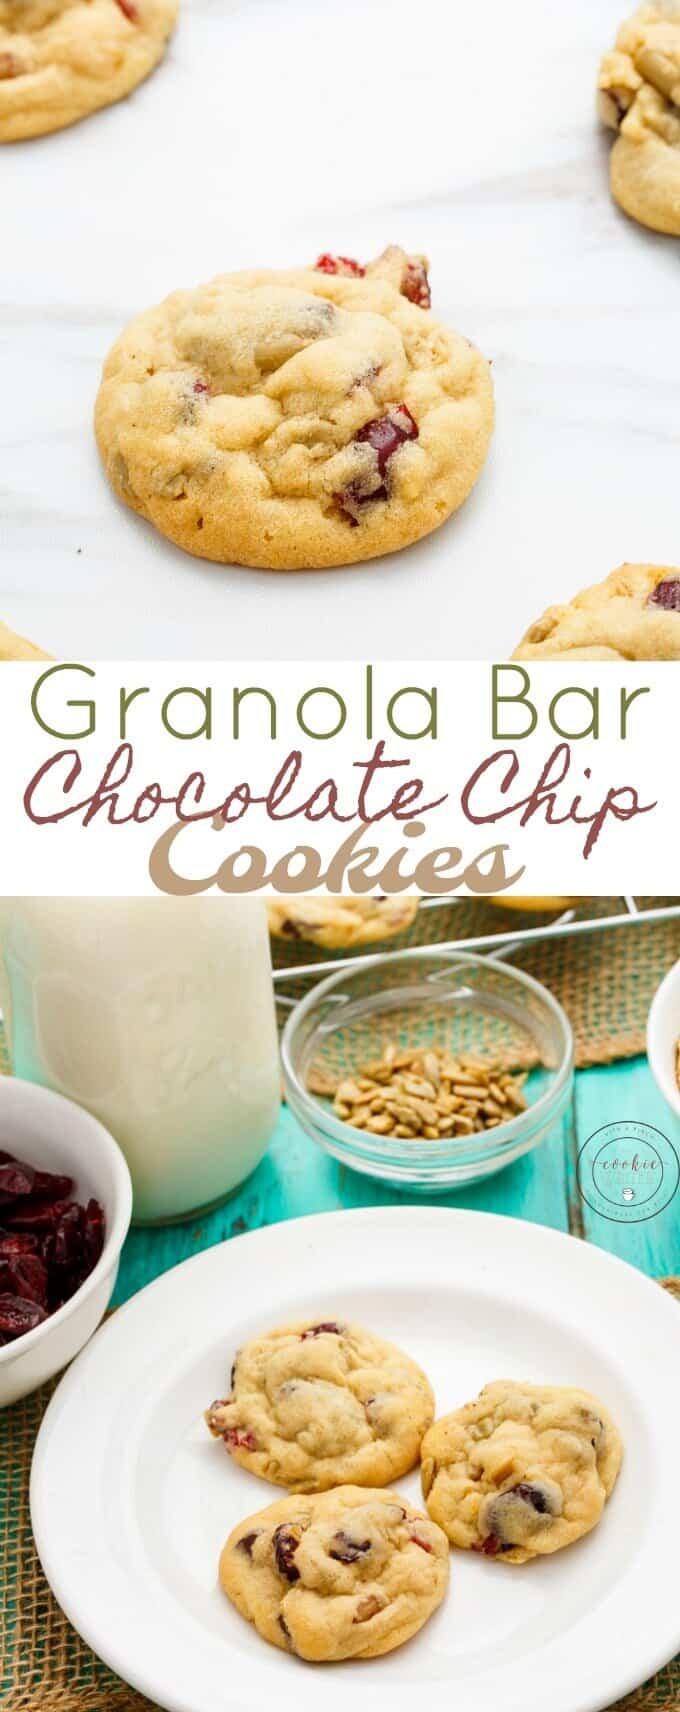 Granola Bar Chocolate Chip Cookies